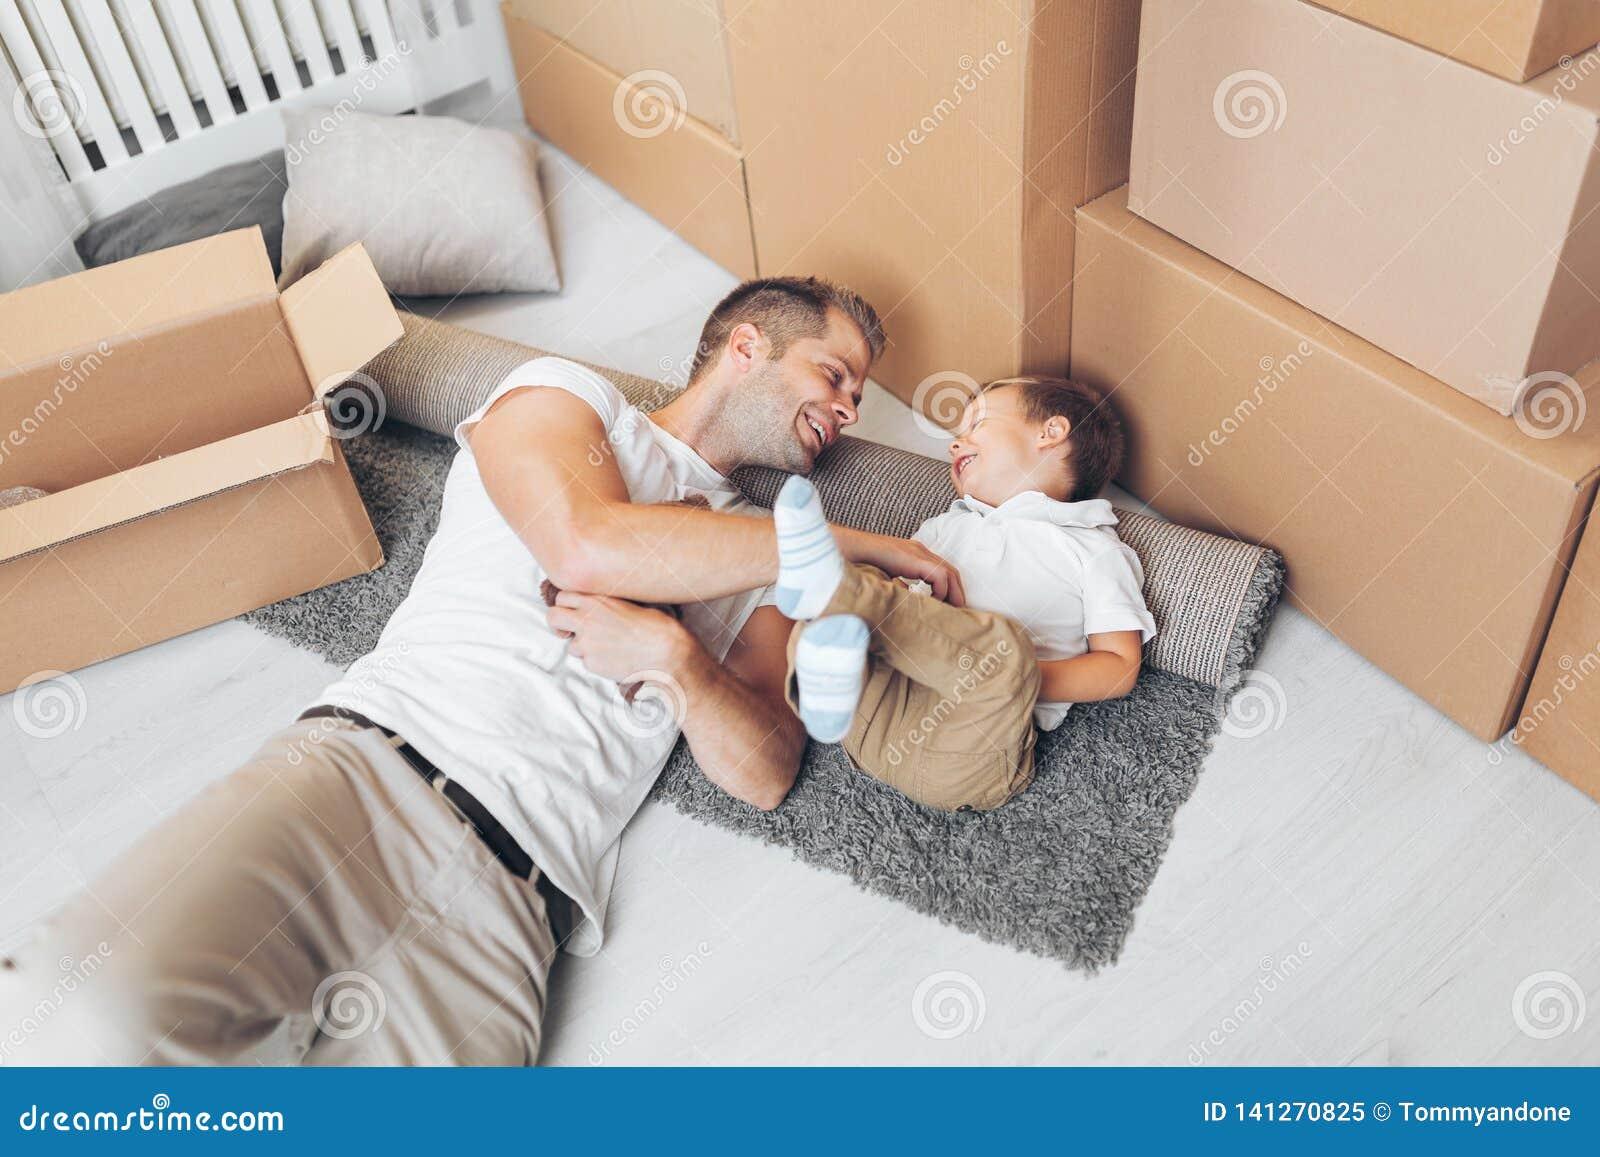 Concepto móvil, padre e hijo moviéndose a un nuevo hogar